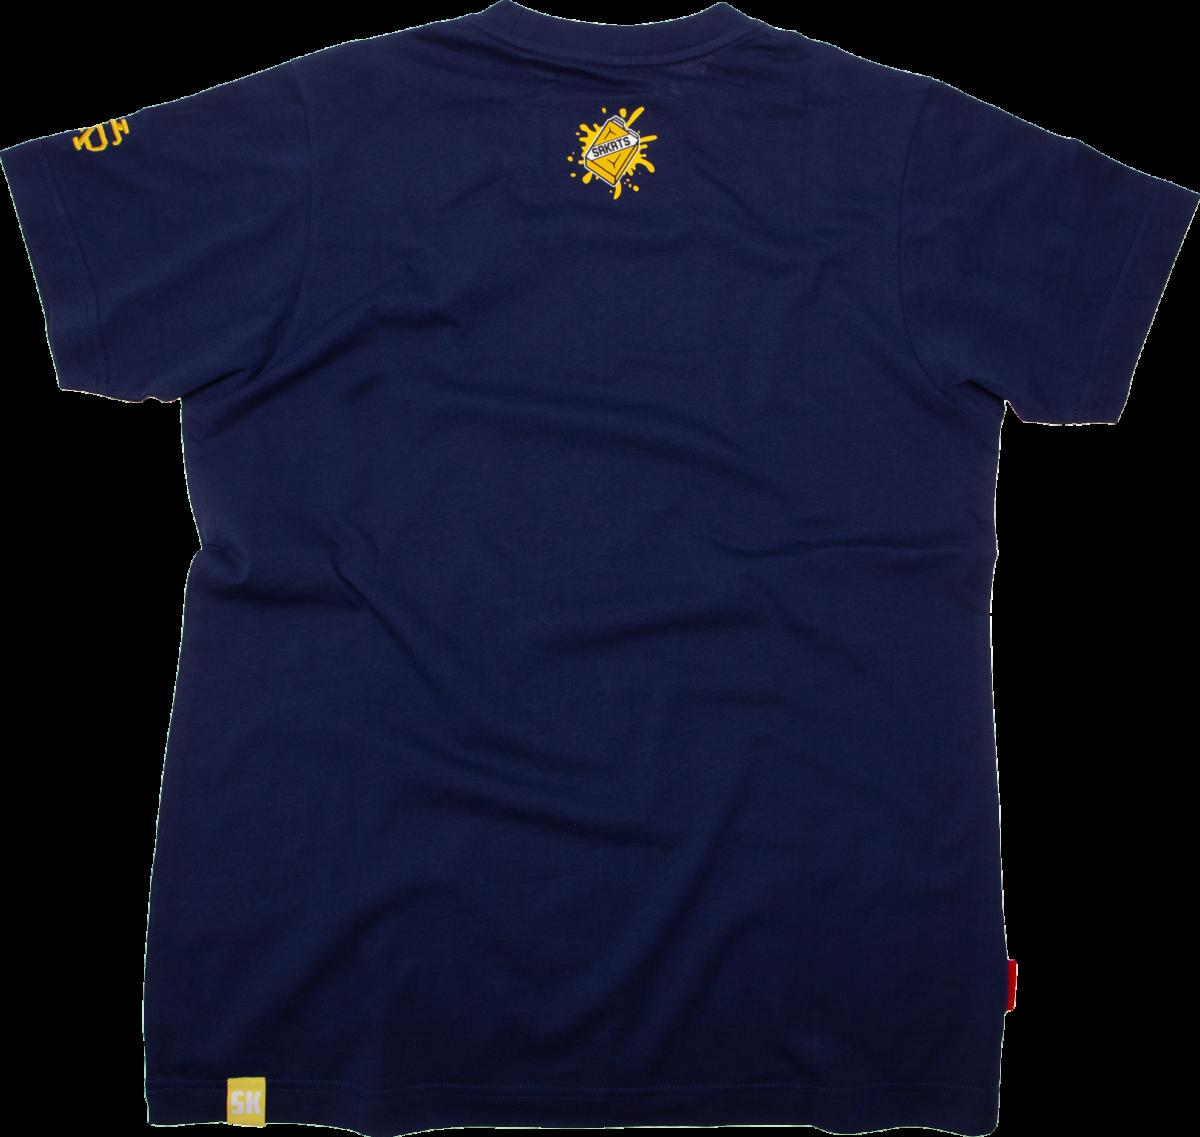 Sourkrauts T-Shirt Marcel